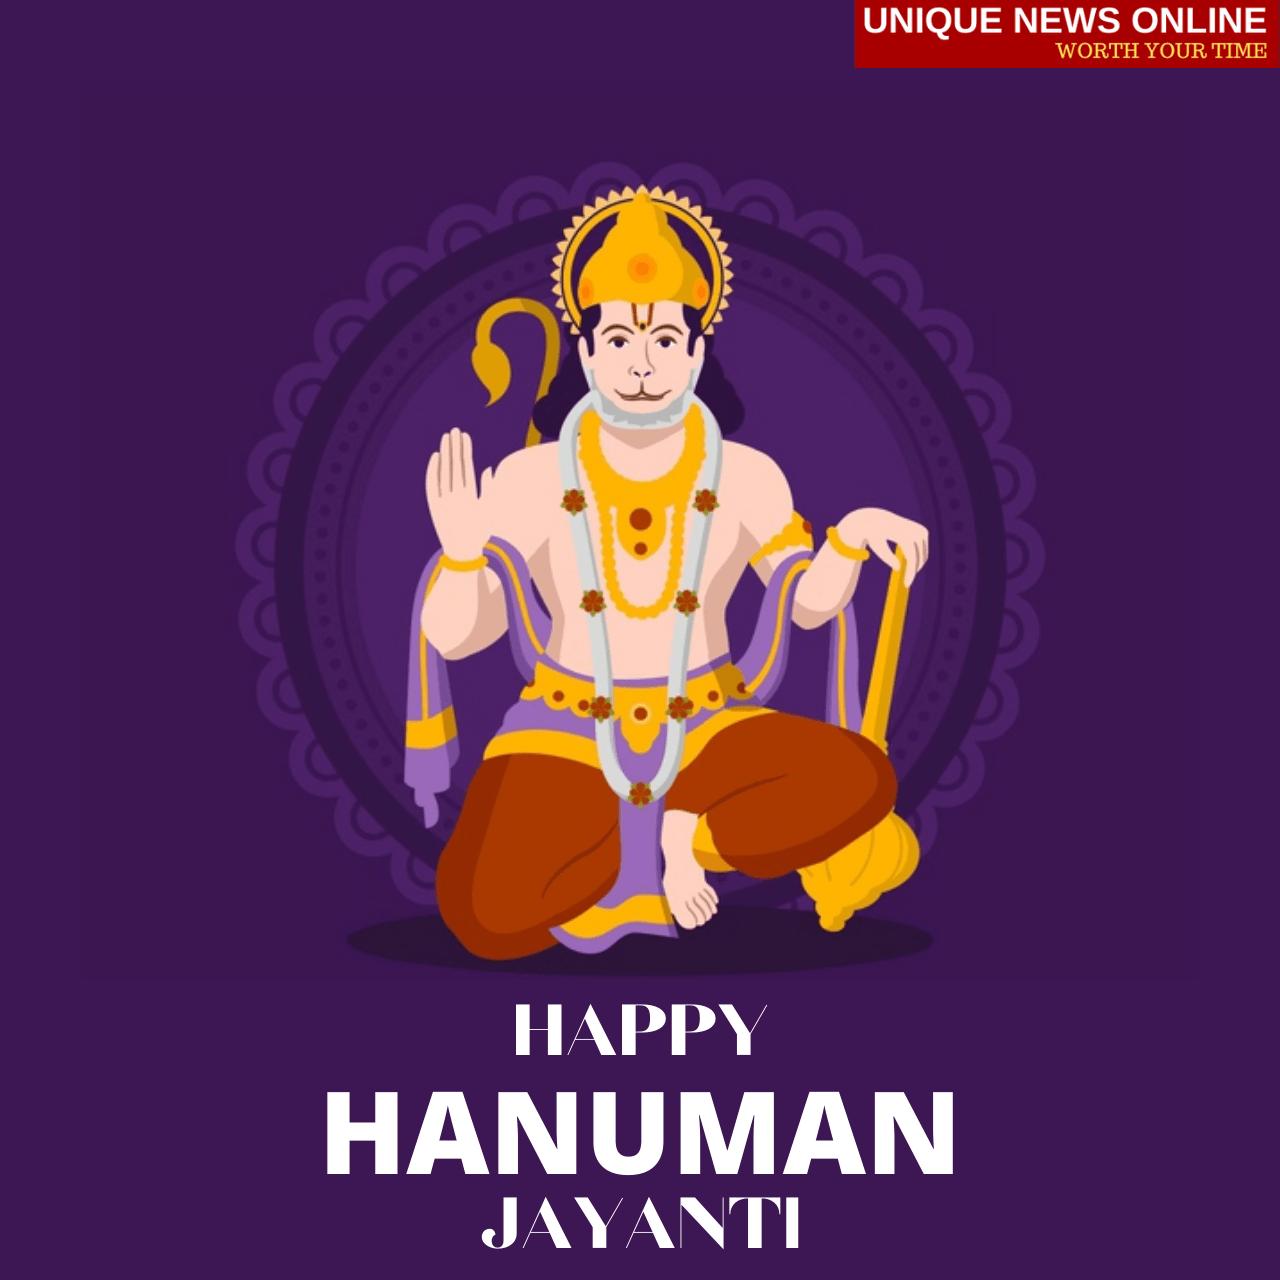 Happy Hanuman Jayanti 2021 WhatsApp Status Video Download for Hanuman Janmostav